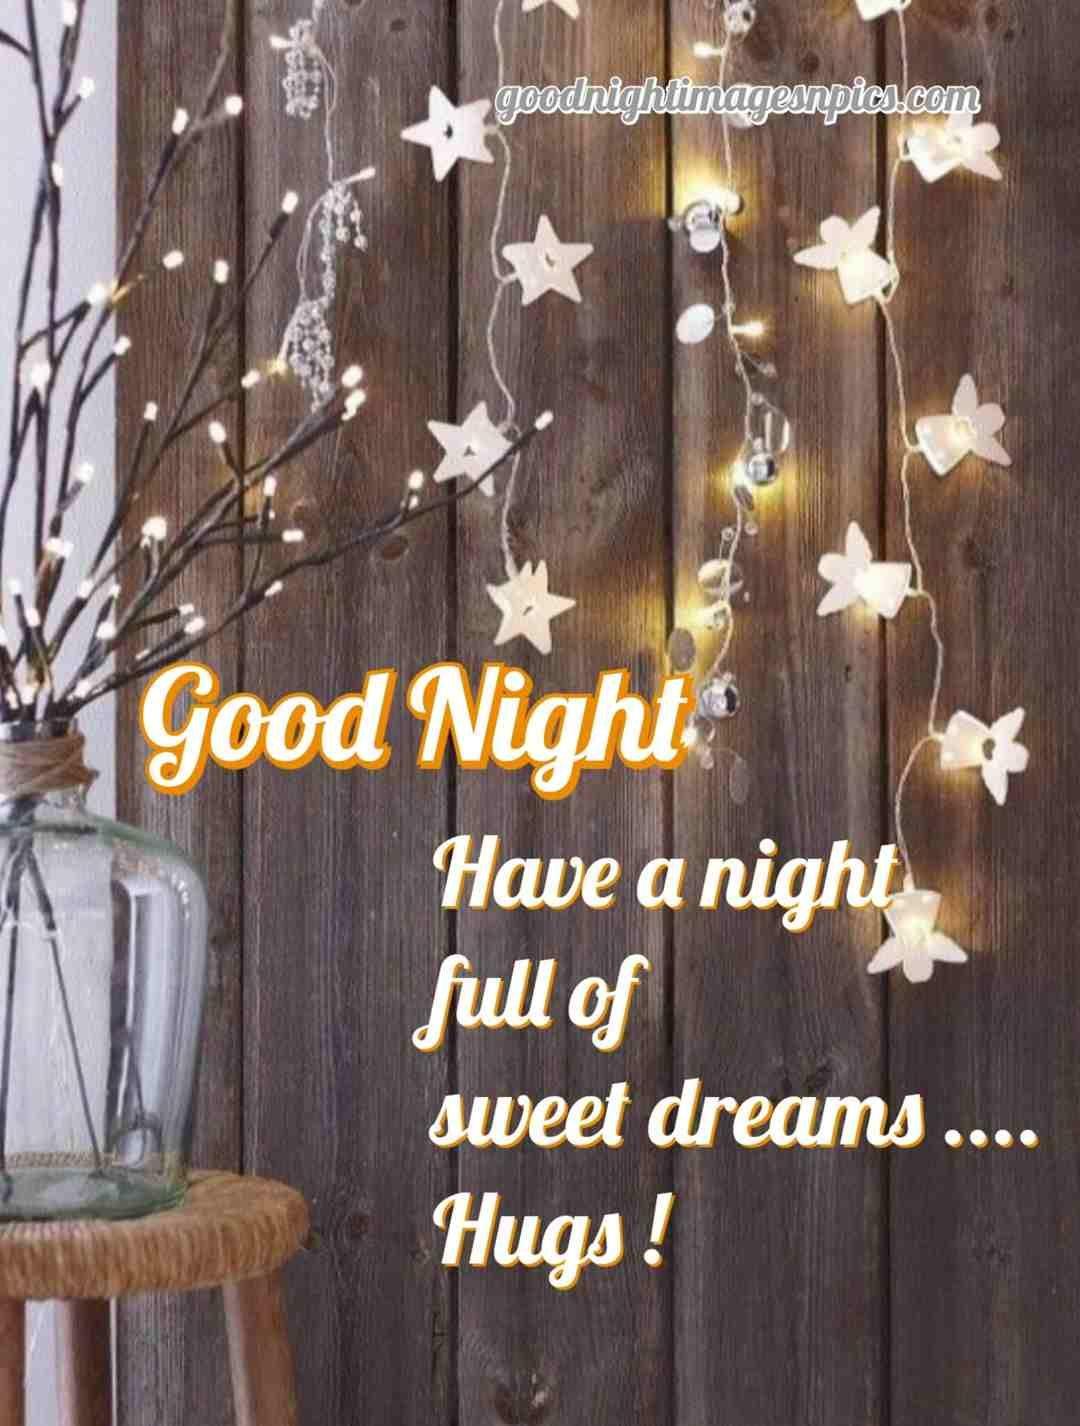 Romantic Good Night Gif For Whatsapp : romantic, night, whatsapp, Night, Images, Whatsapp, Images,, Romantic